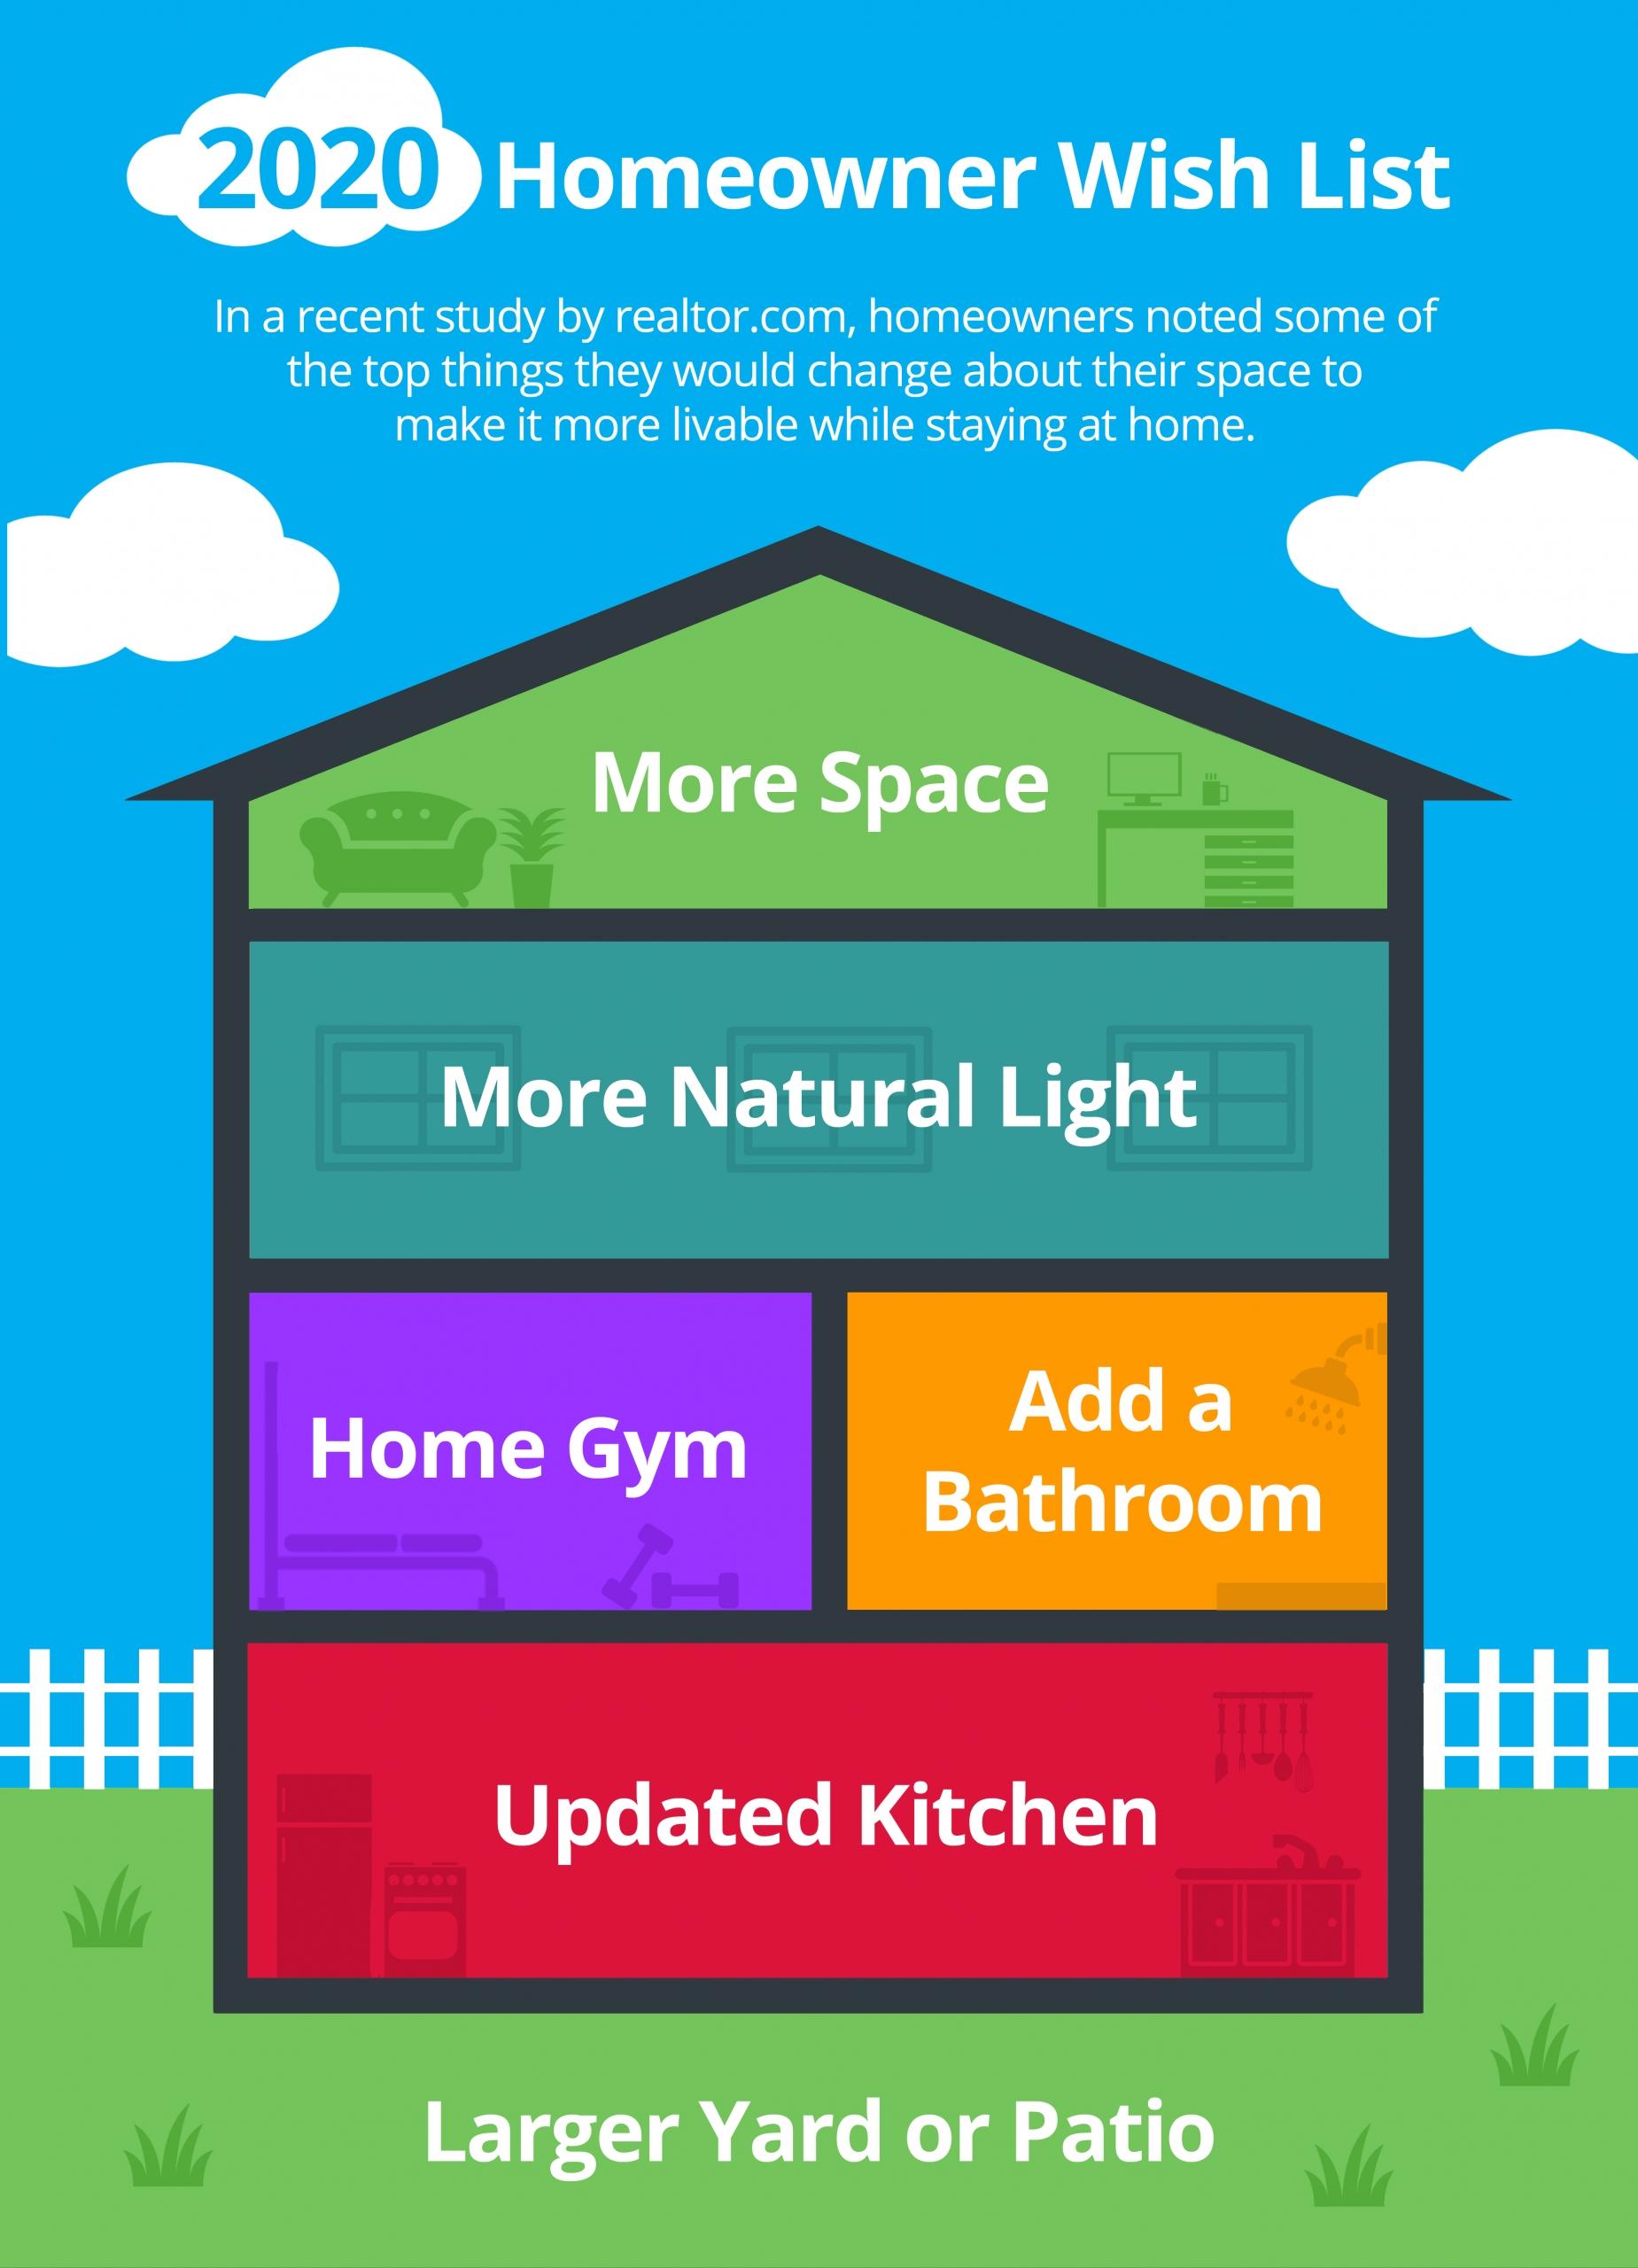 2020 Homeowner Wish List [INFOGRAPHIC] | Bridge Builders